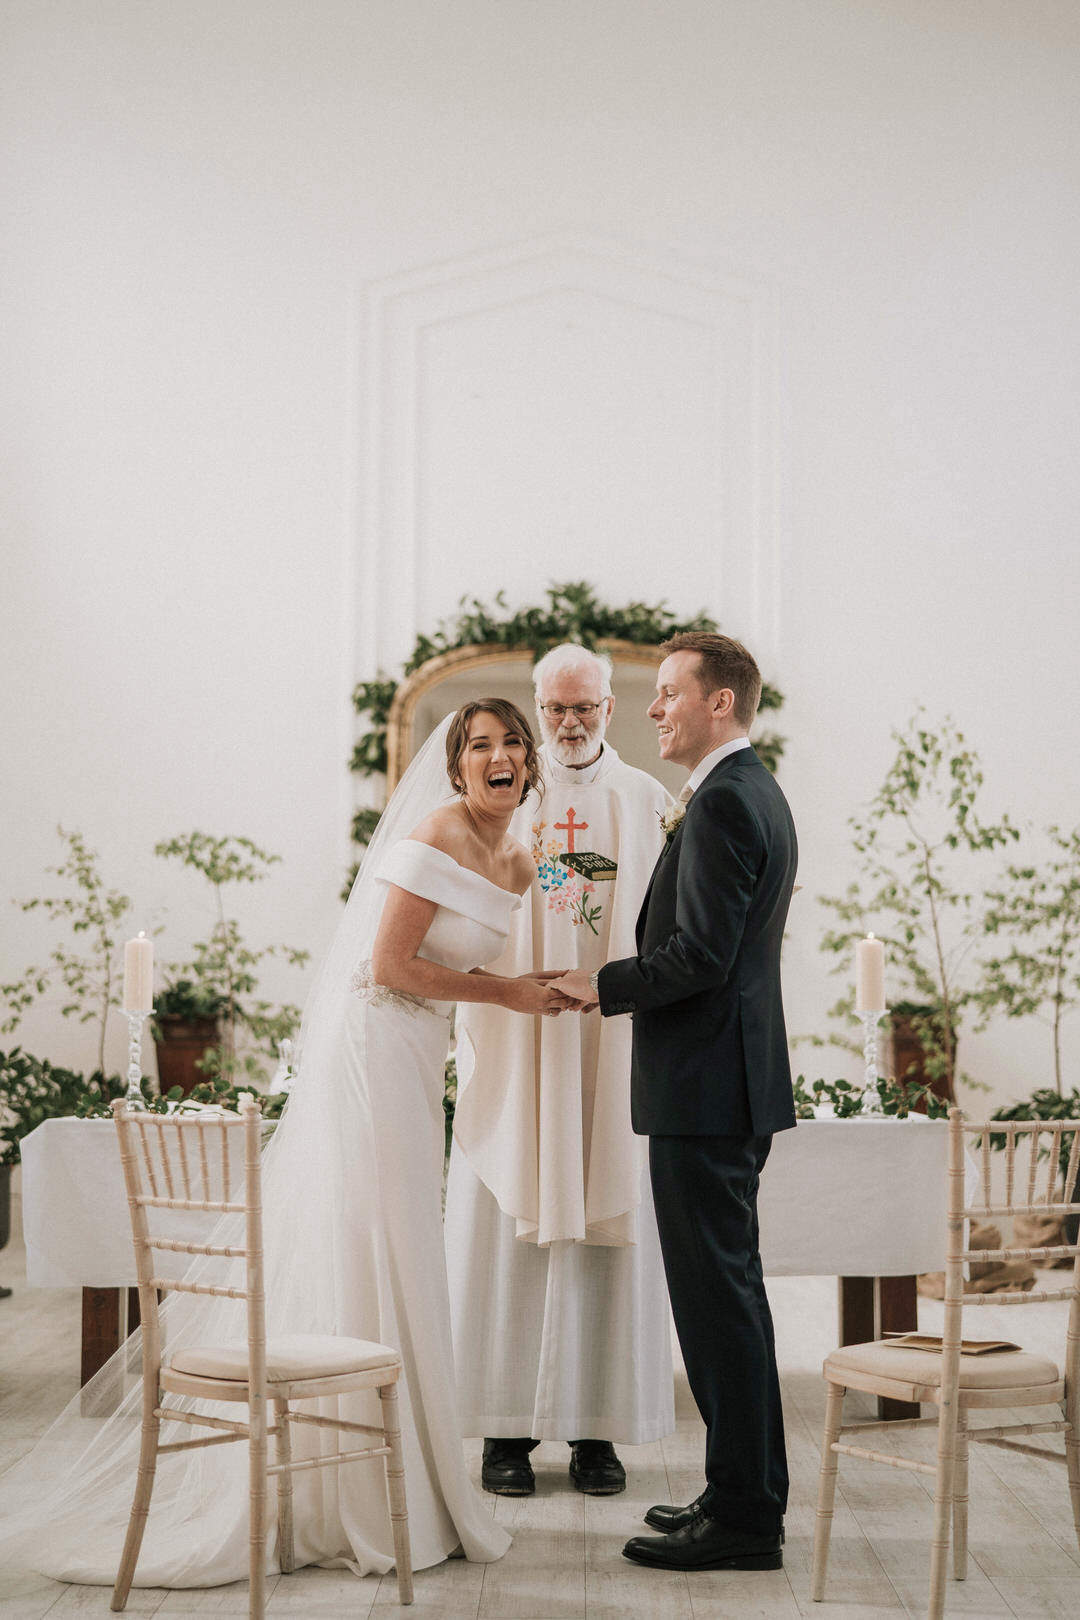 Gloster-House-wedding-photos4 4